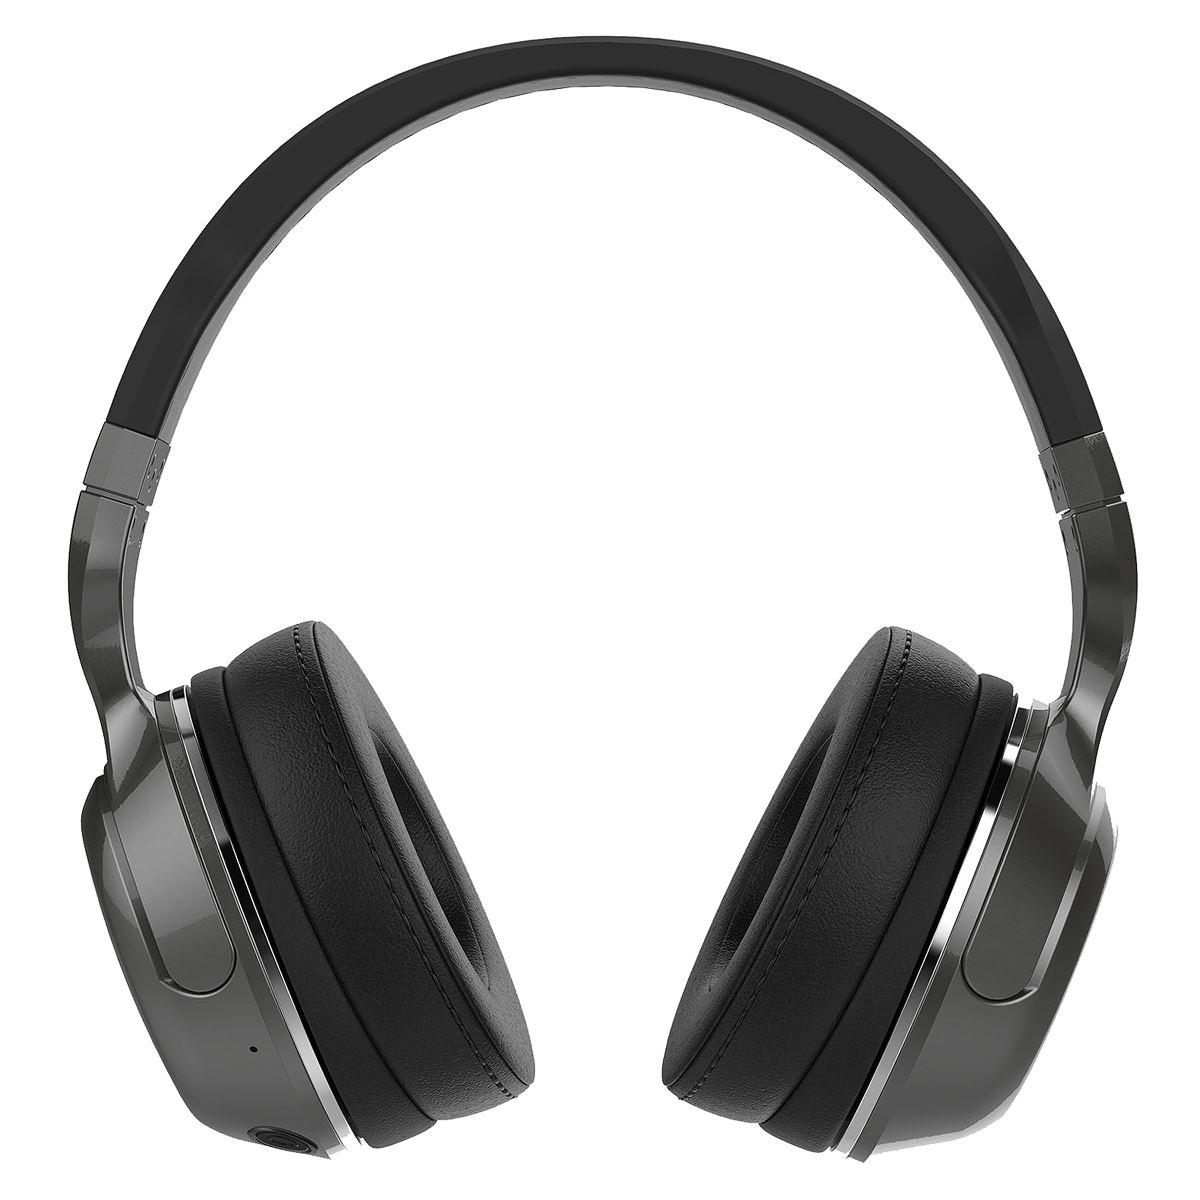 Audífonos Skullcandy S6HBHY-516